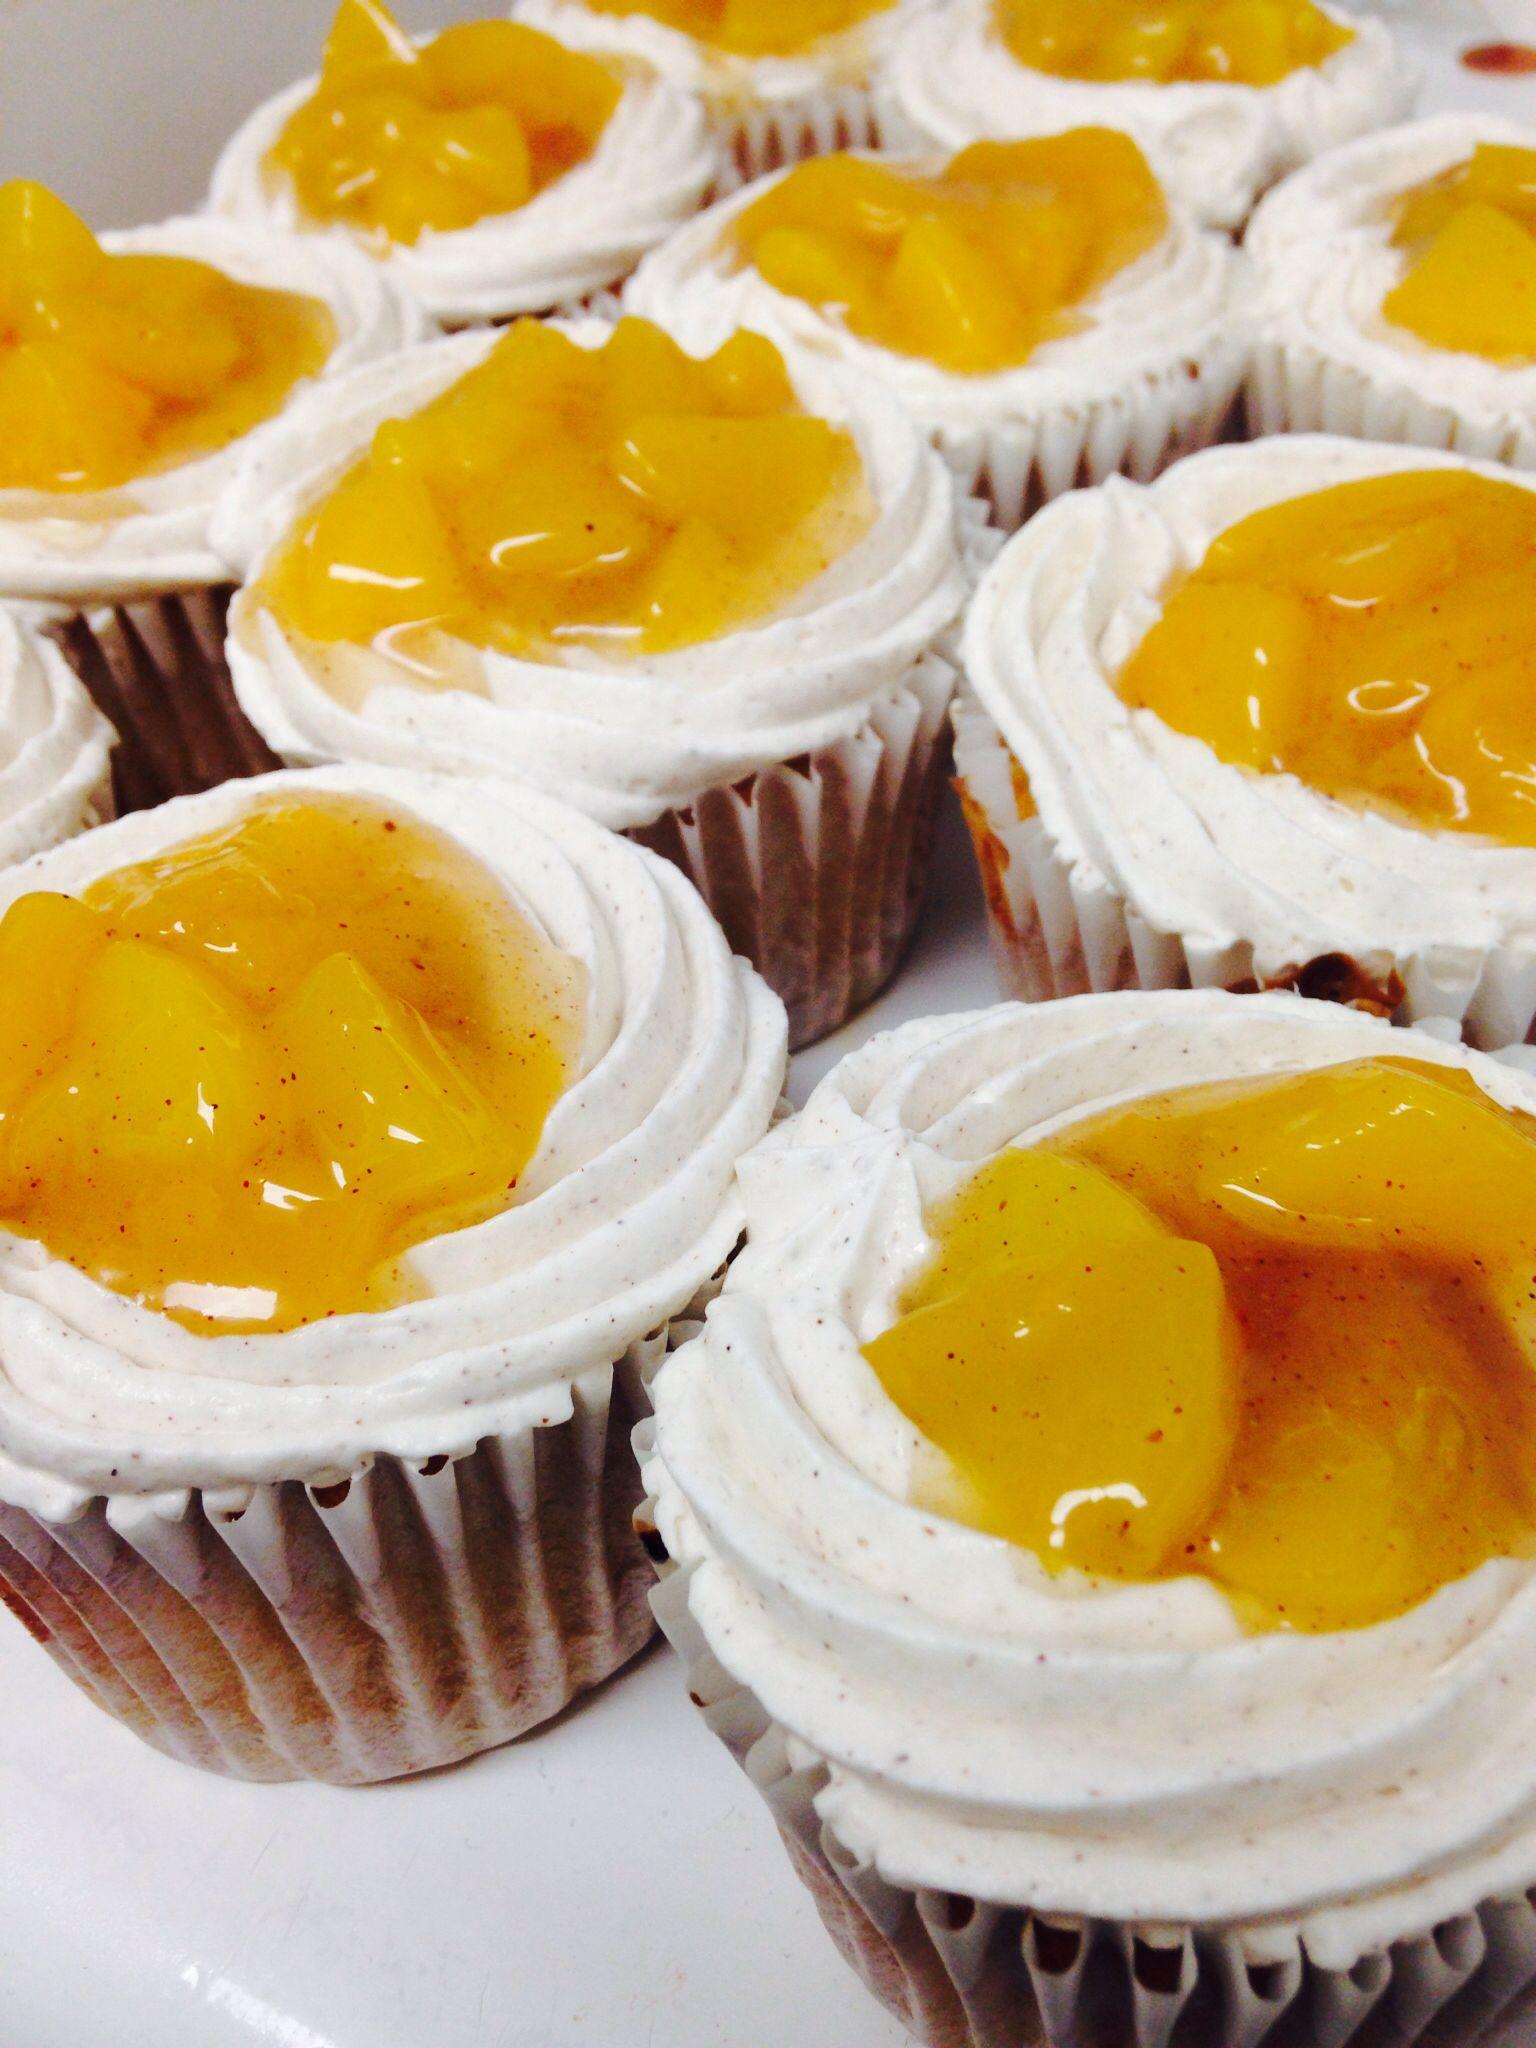 Peach cobbler cupcakes | Cake-y | Pinterest